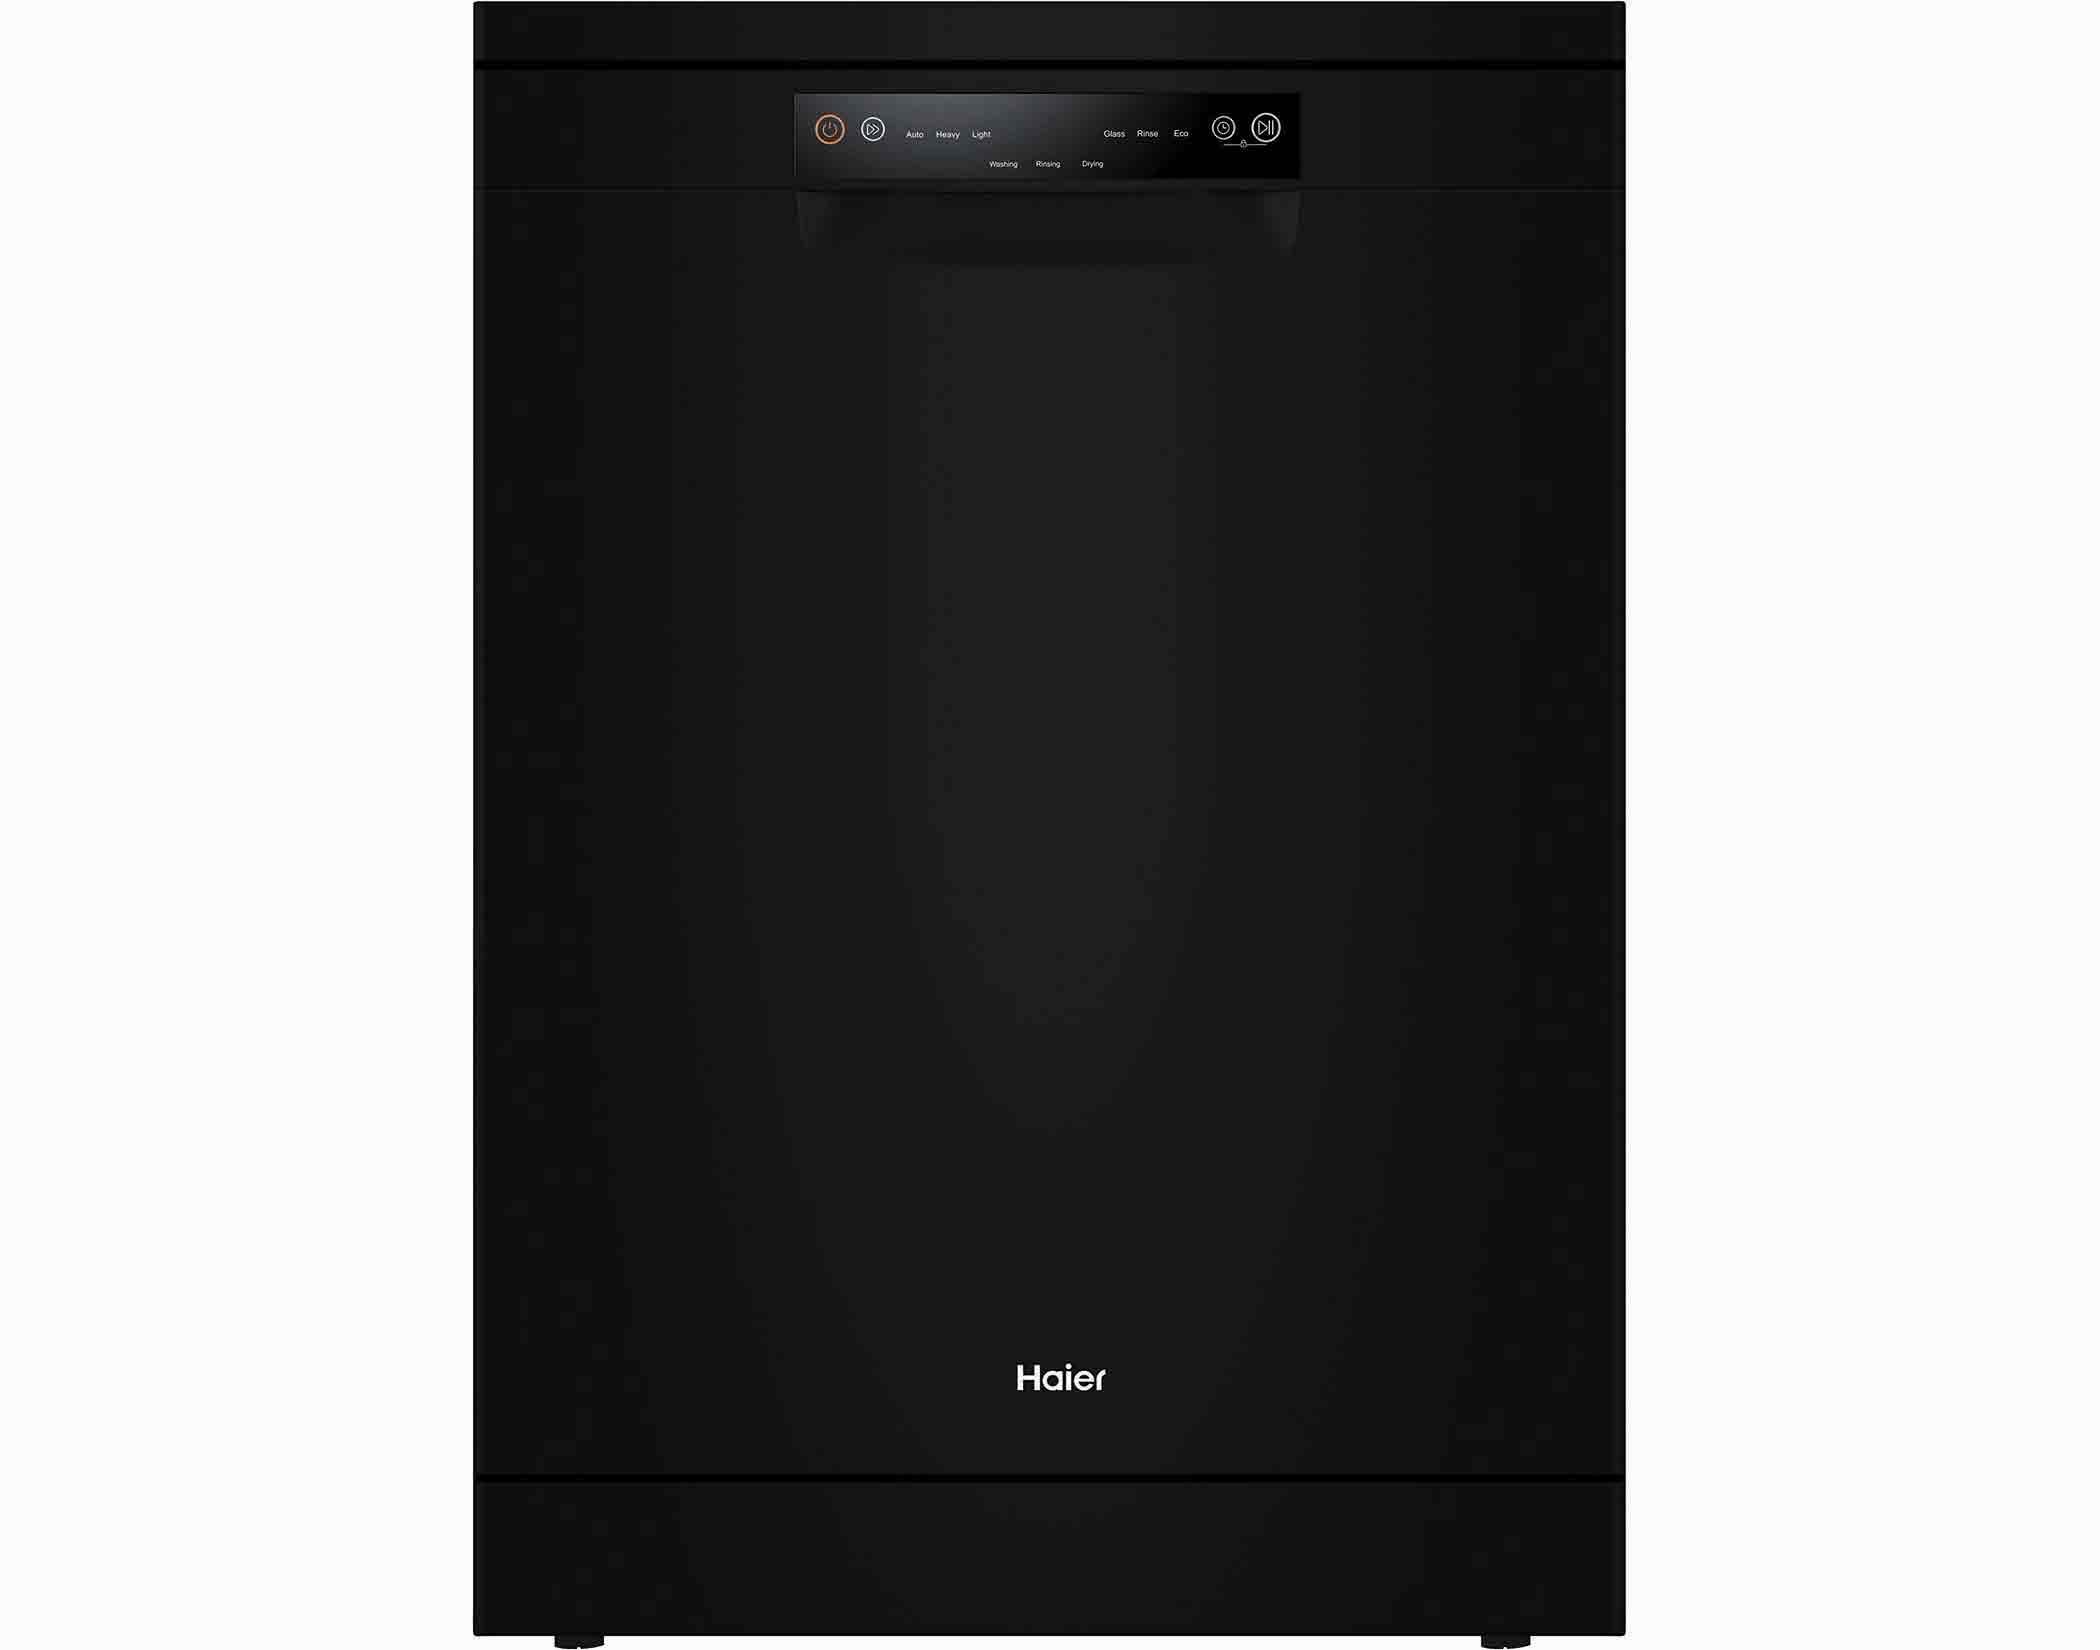 Haier HDW15V2B2 15 Place Setting Freestanding Dishwasher in Black